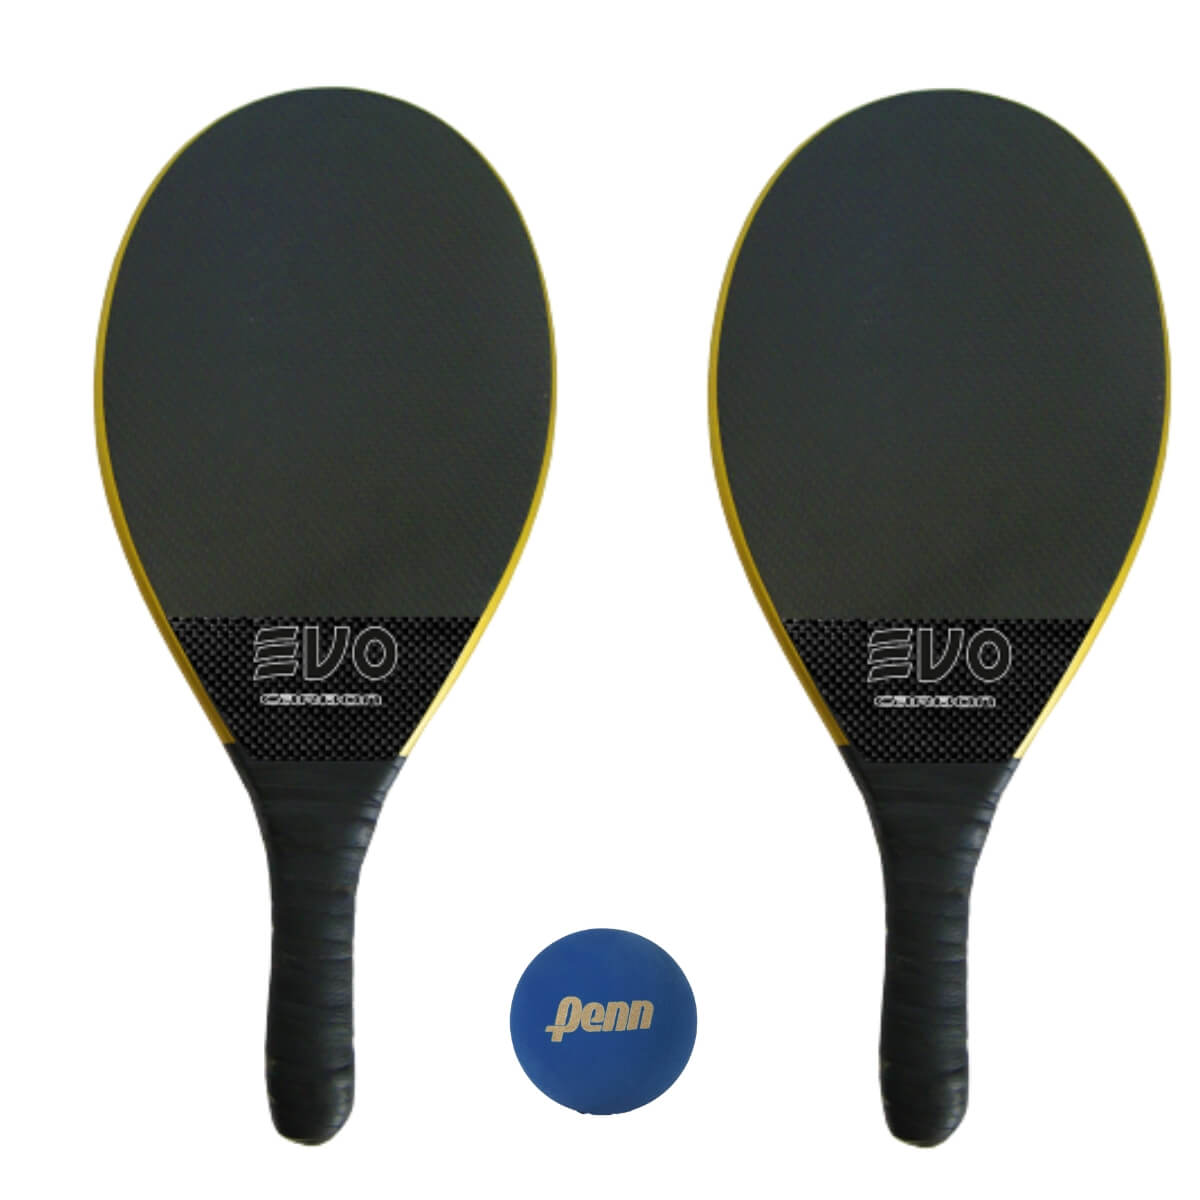 Kit Raquetes Frescobol Evo Carbon Pro Preto com Bola Penn